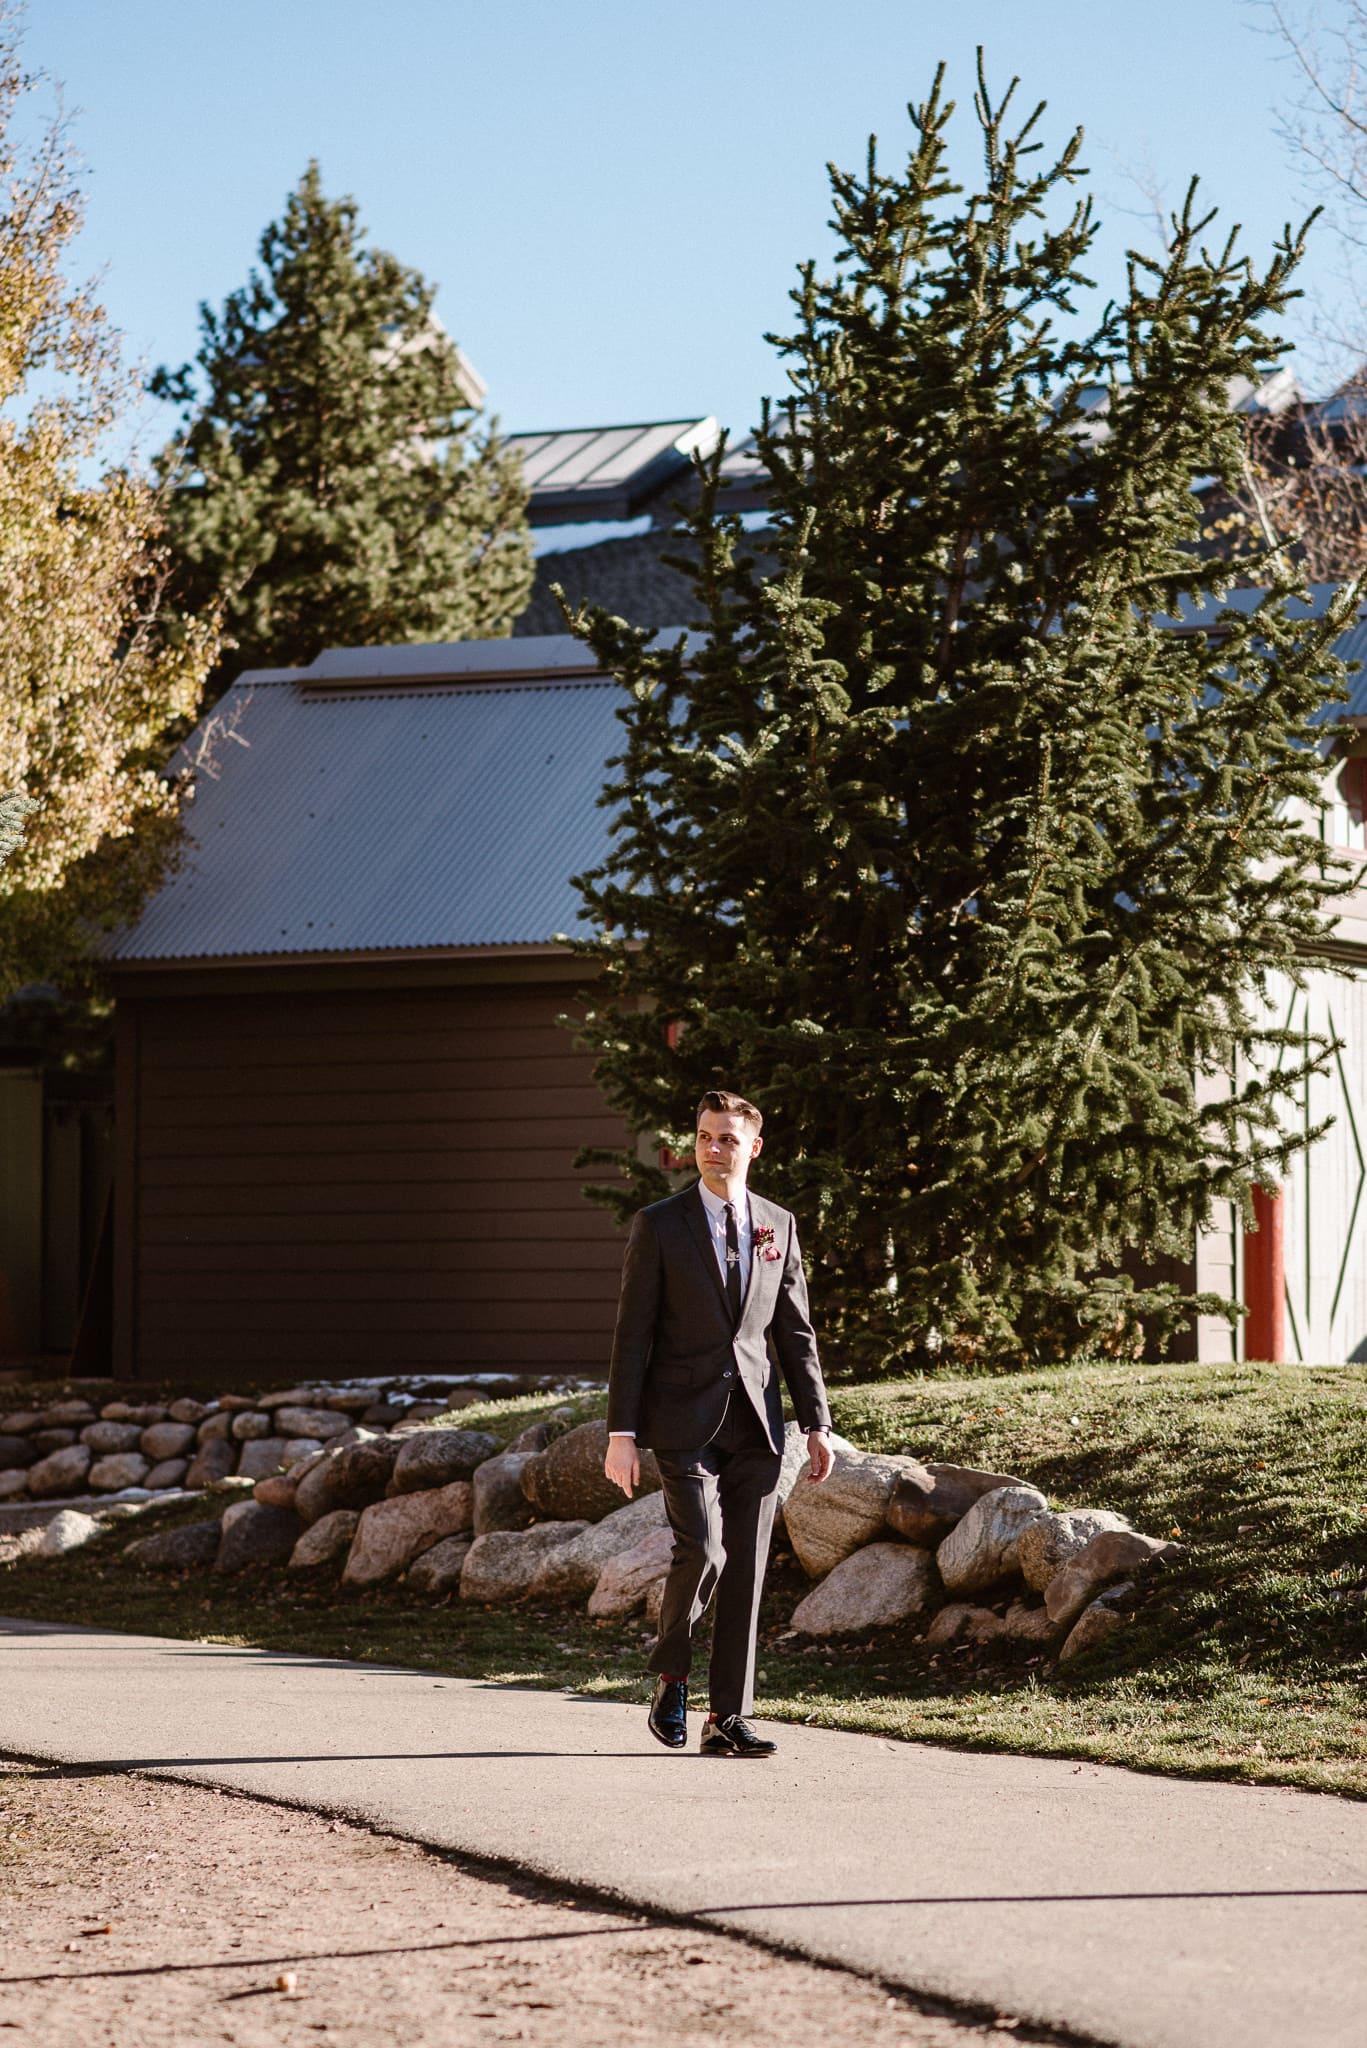 Silverthorne Pavilion wedding ceremony, Colorado wedding photographer, groom walking down ceremony aisle